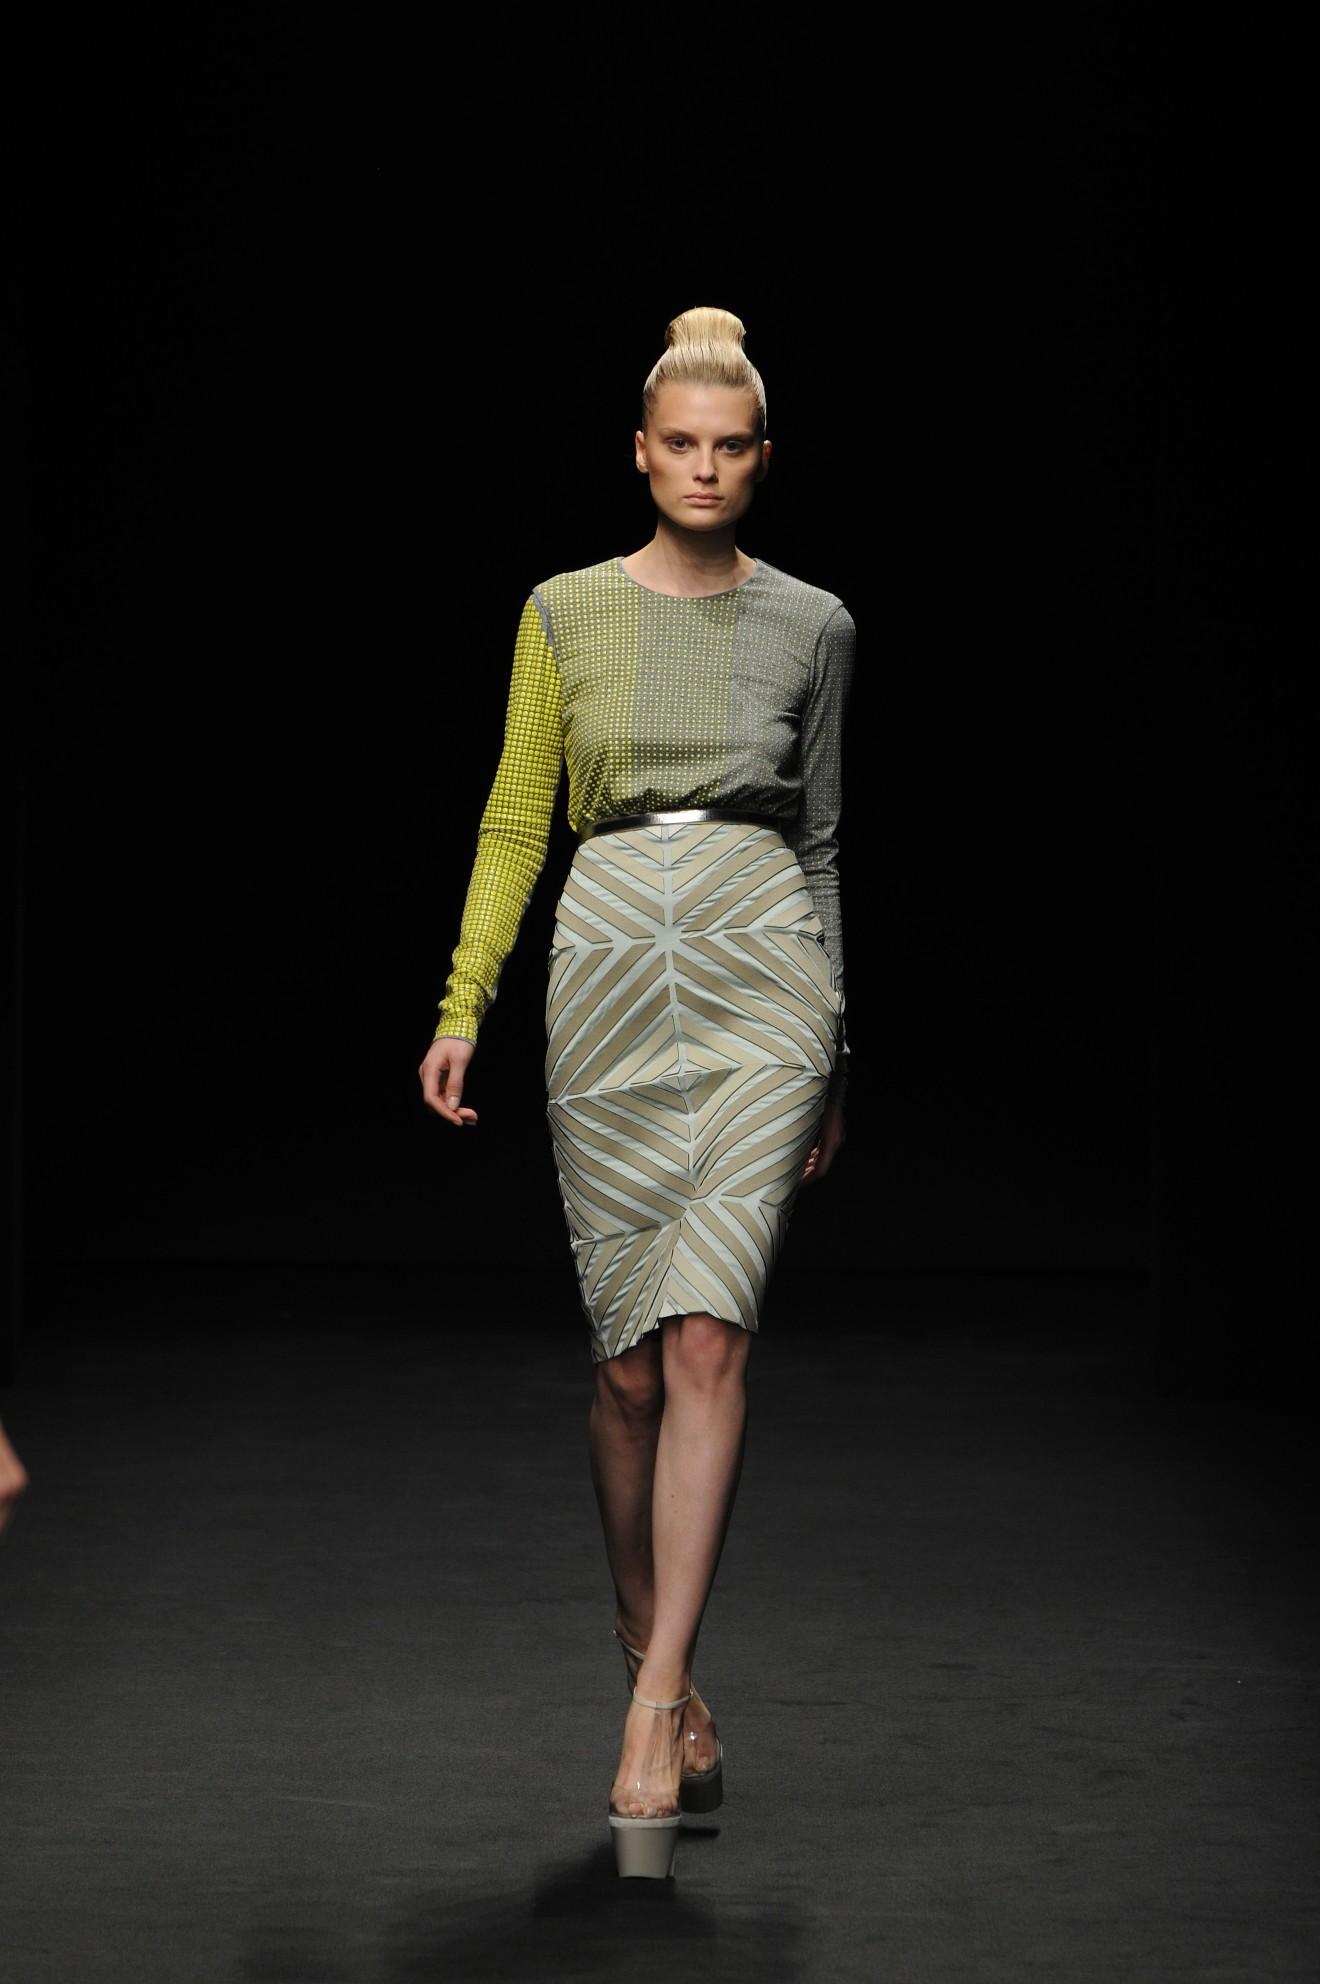 Milan Fashion Week The Graphic Minimalism Of Marco De Vincenzo Fbf